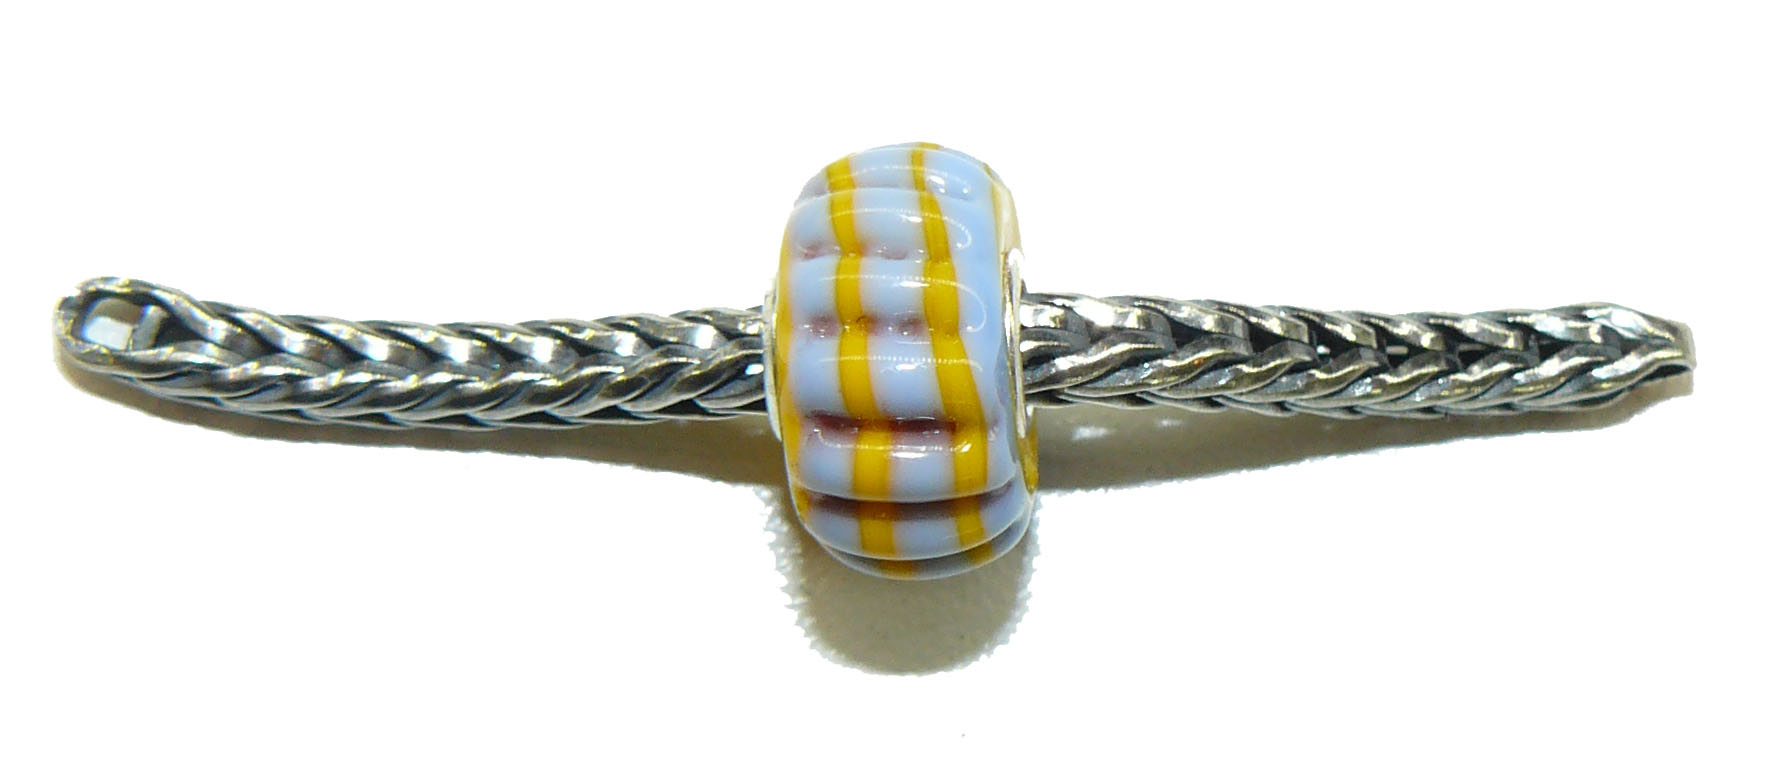 Trollbead Ooak Bumpy grey with yellow Stripes